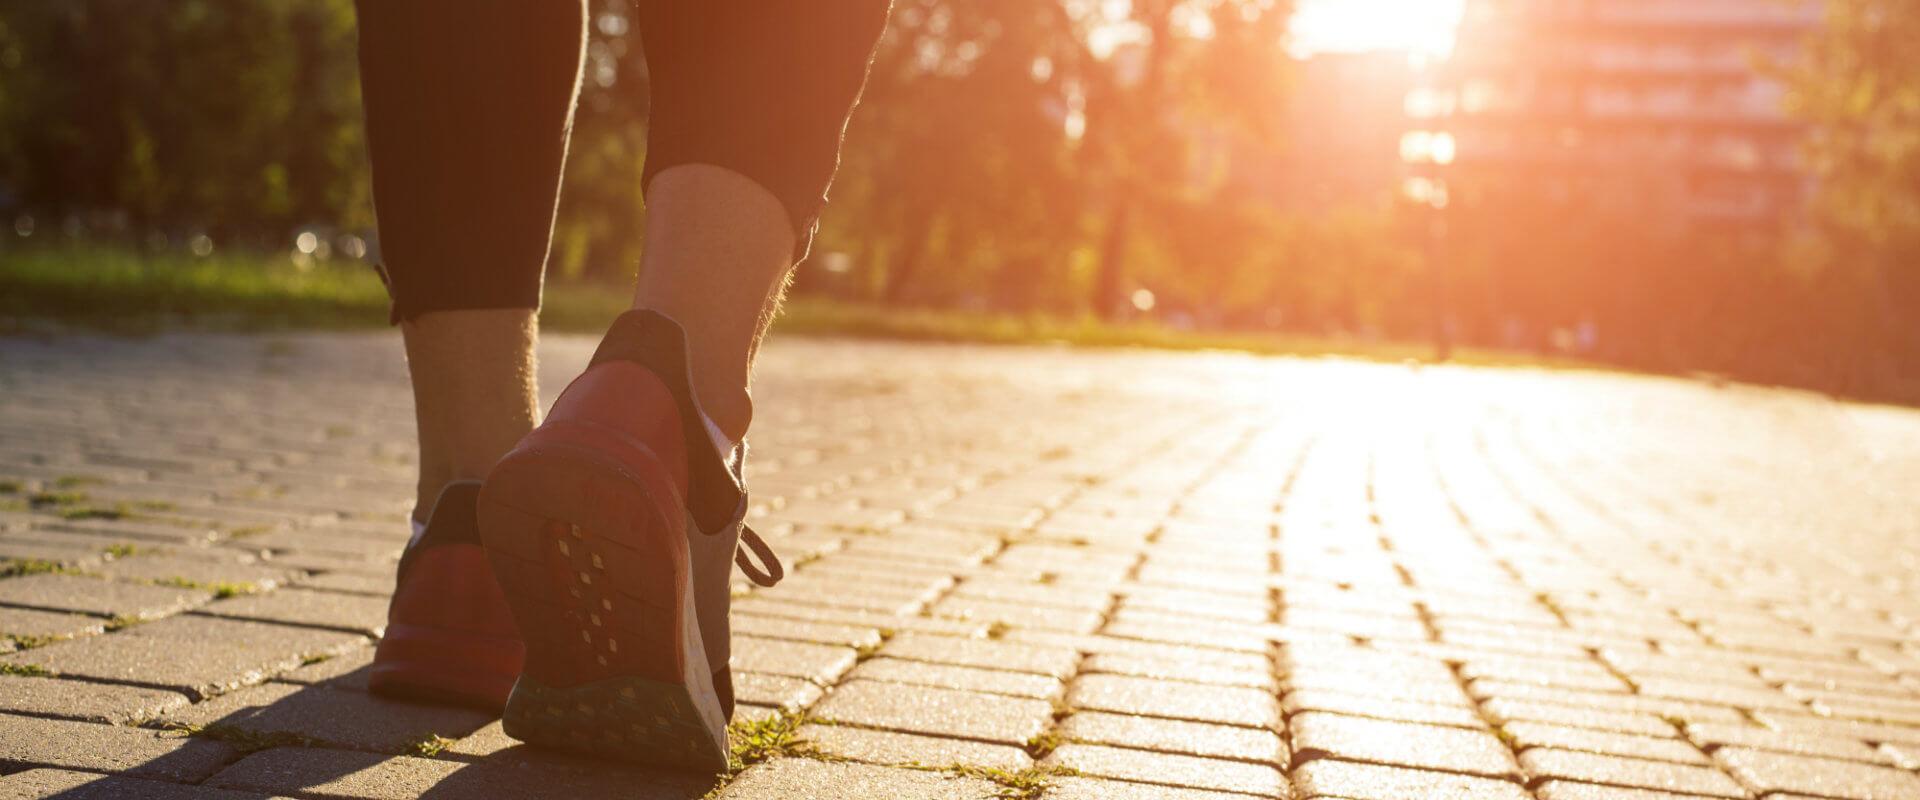 caminar-pies-caminando-walkmaxx